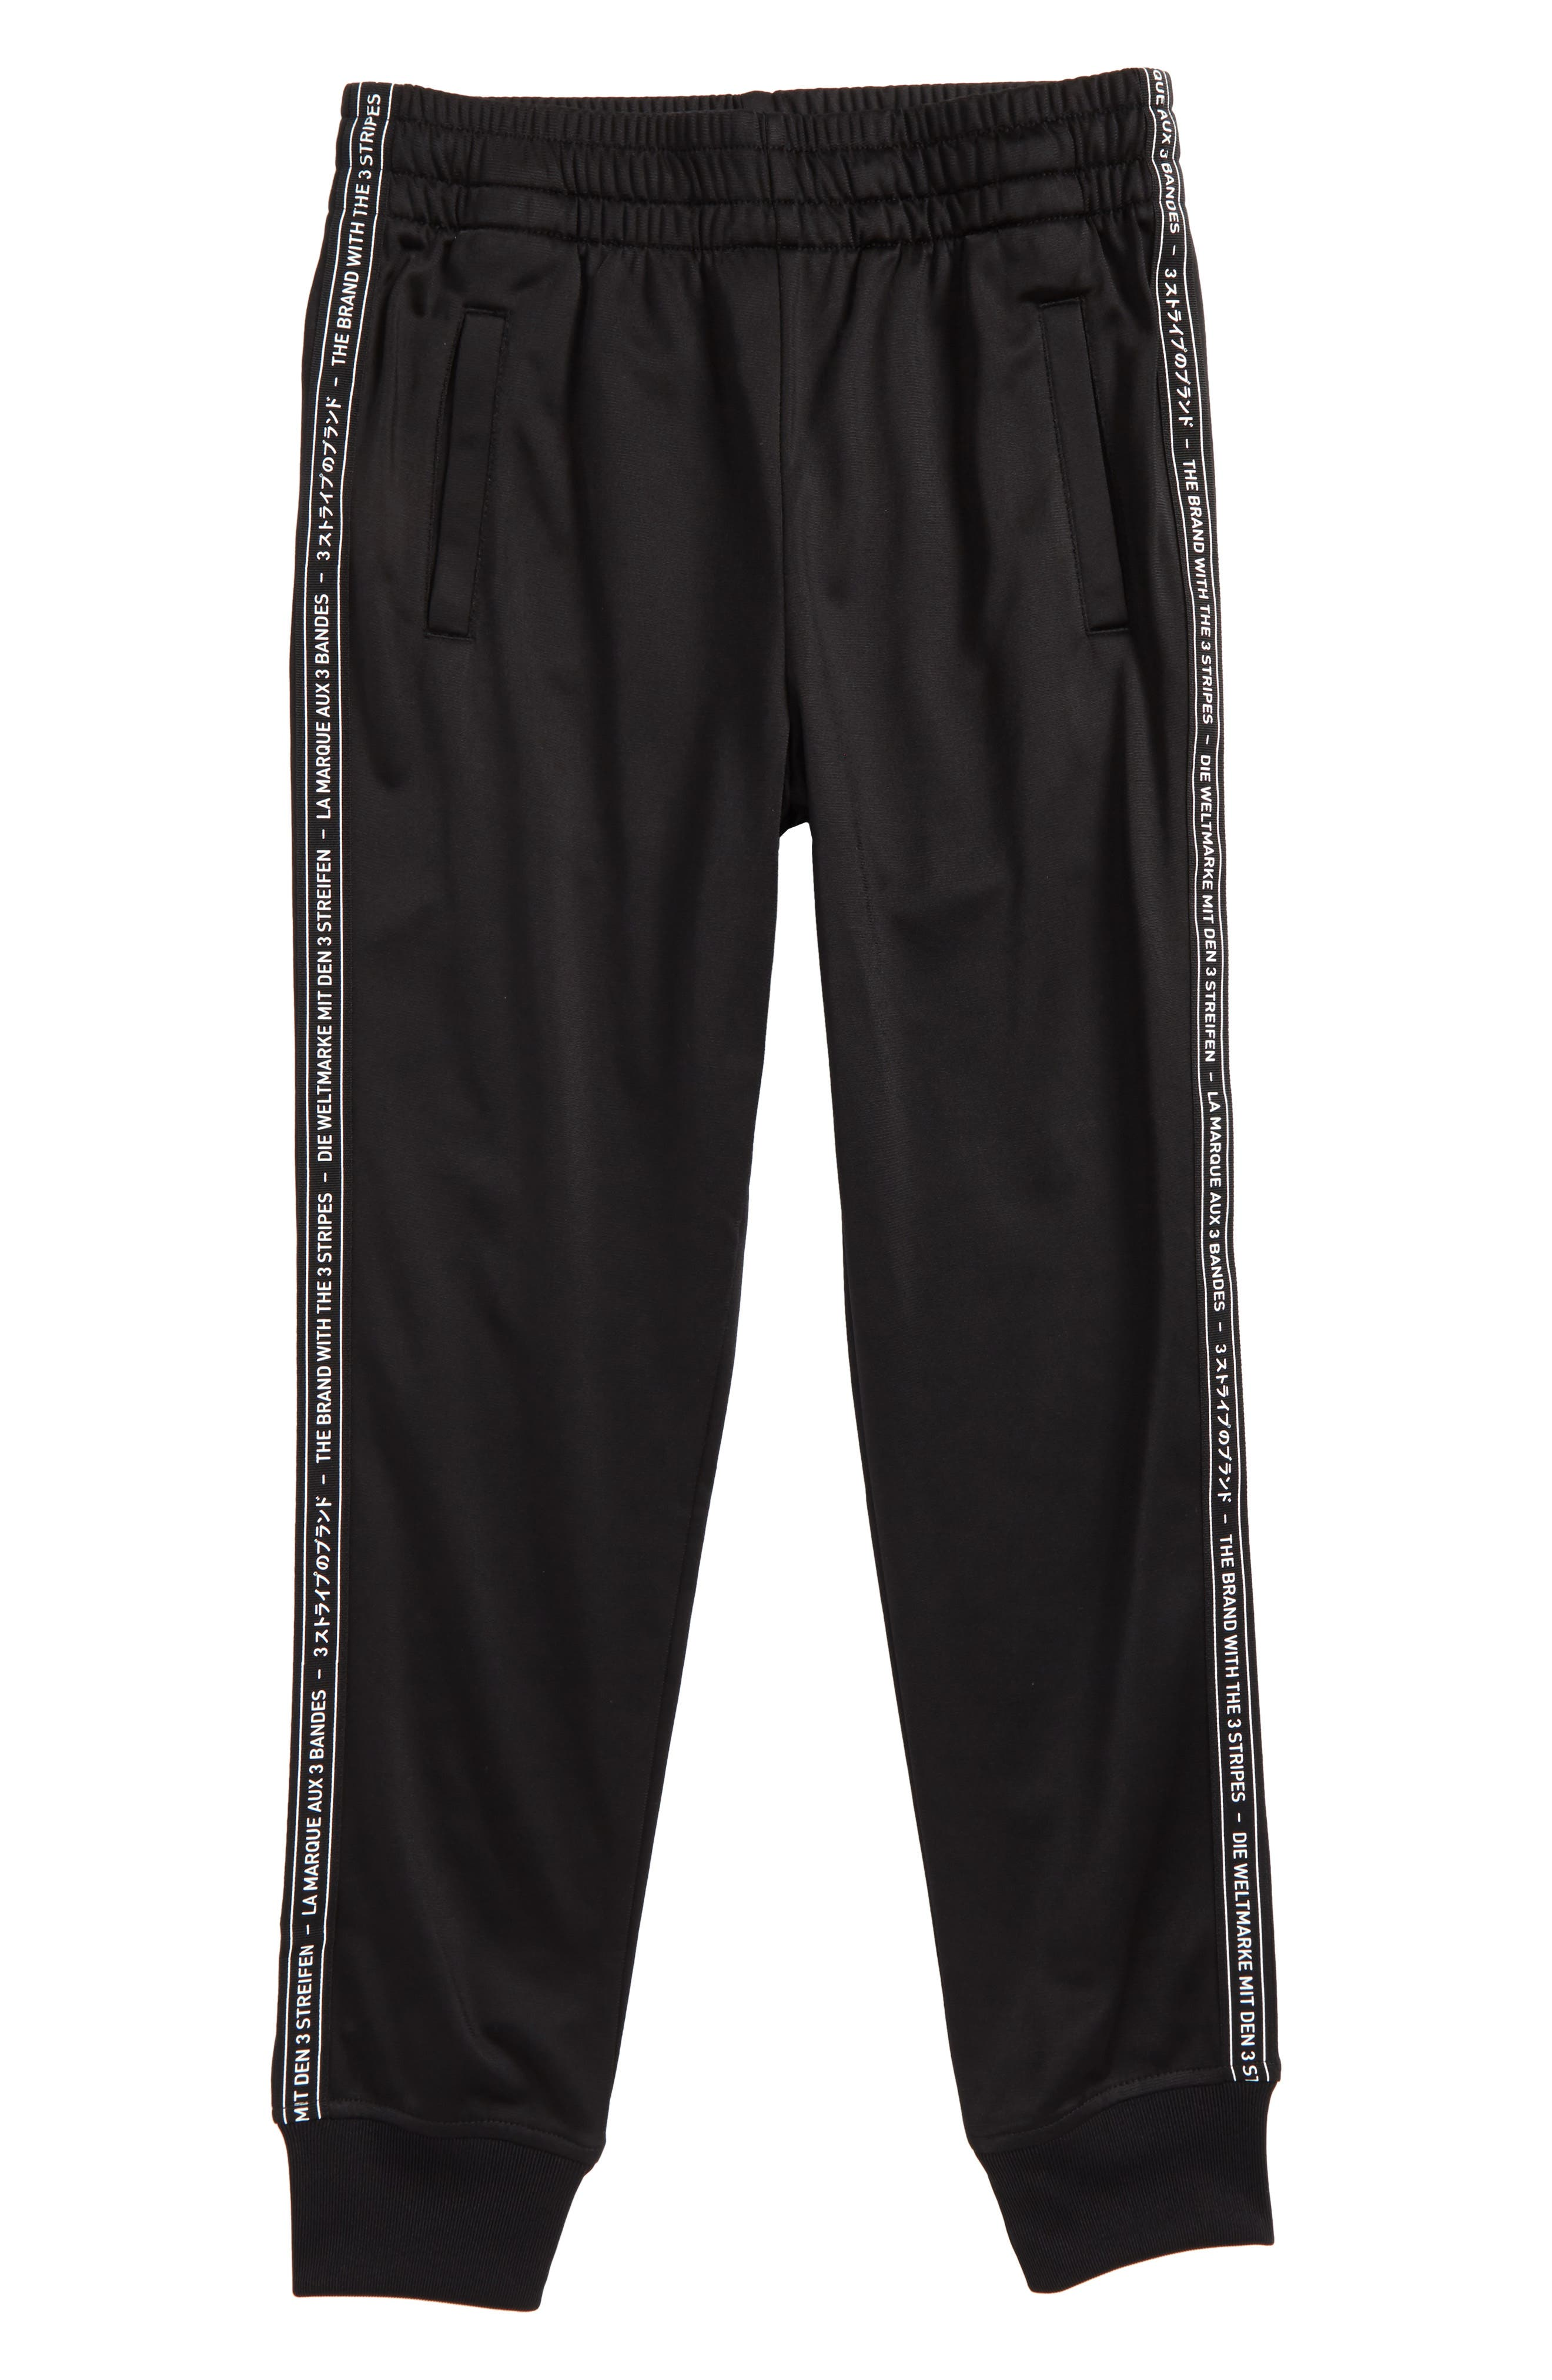 Alternate Image 1 Selected - adidas Originals Superstar Tiro Track Pants (Little Boys & Big Boys)